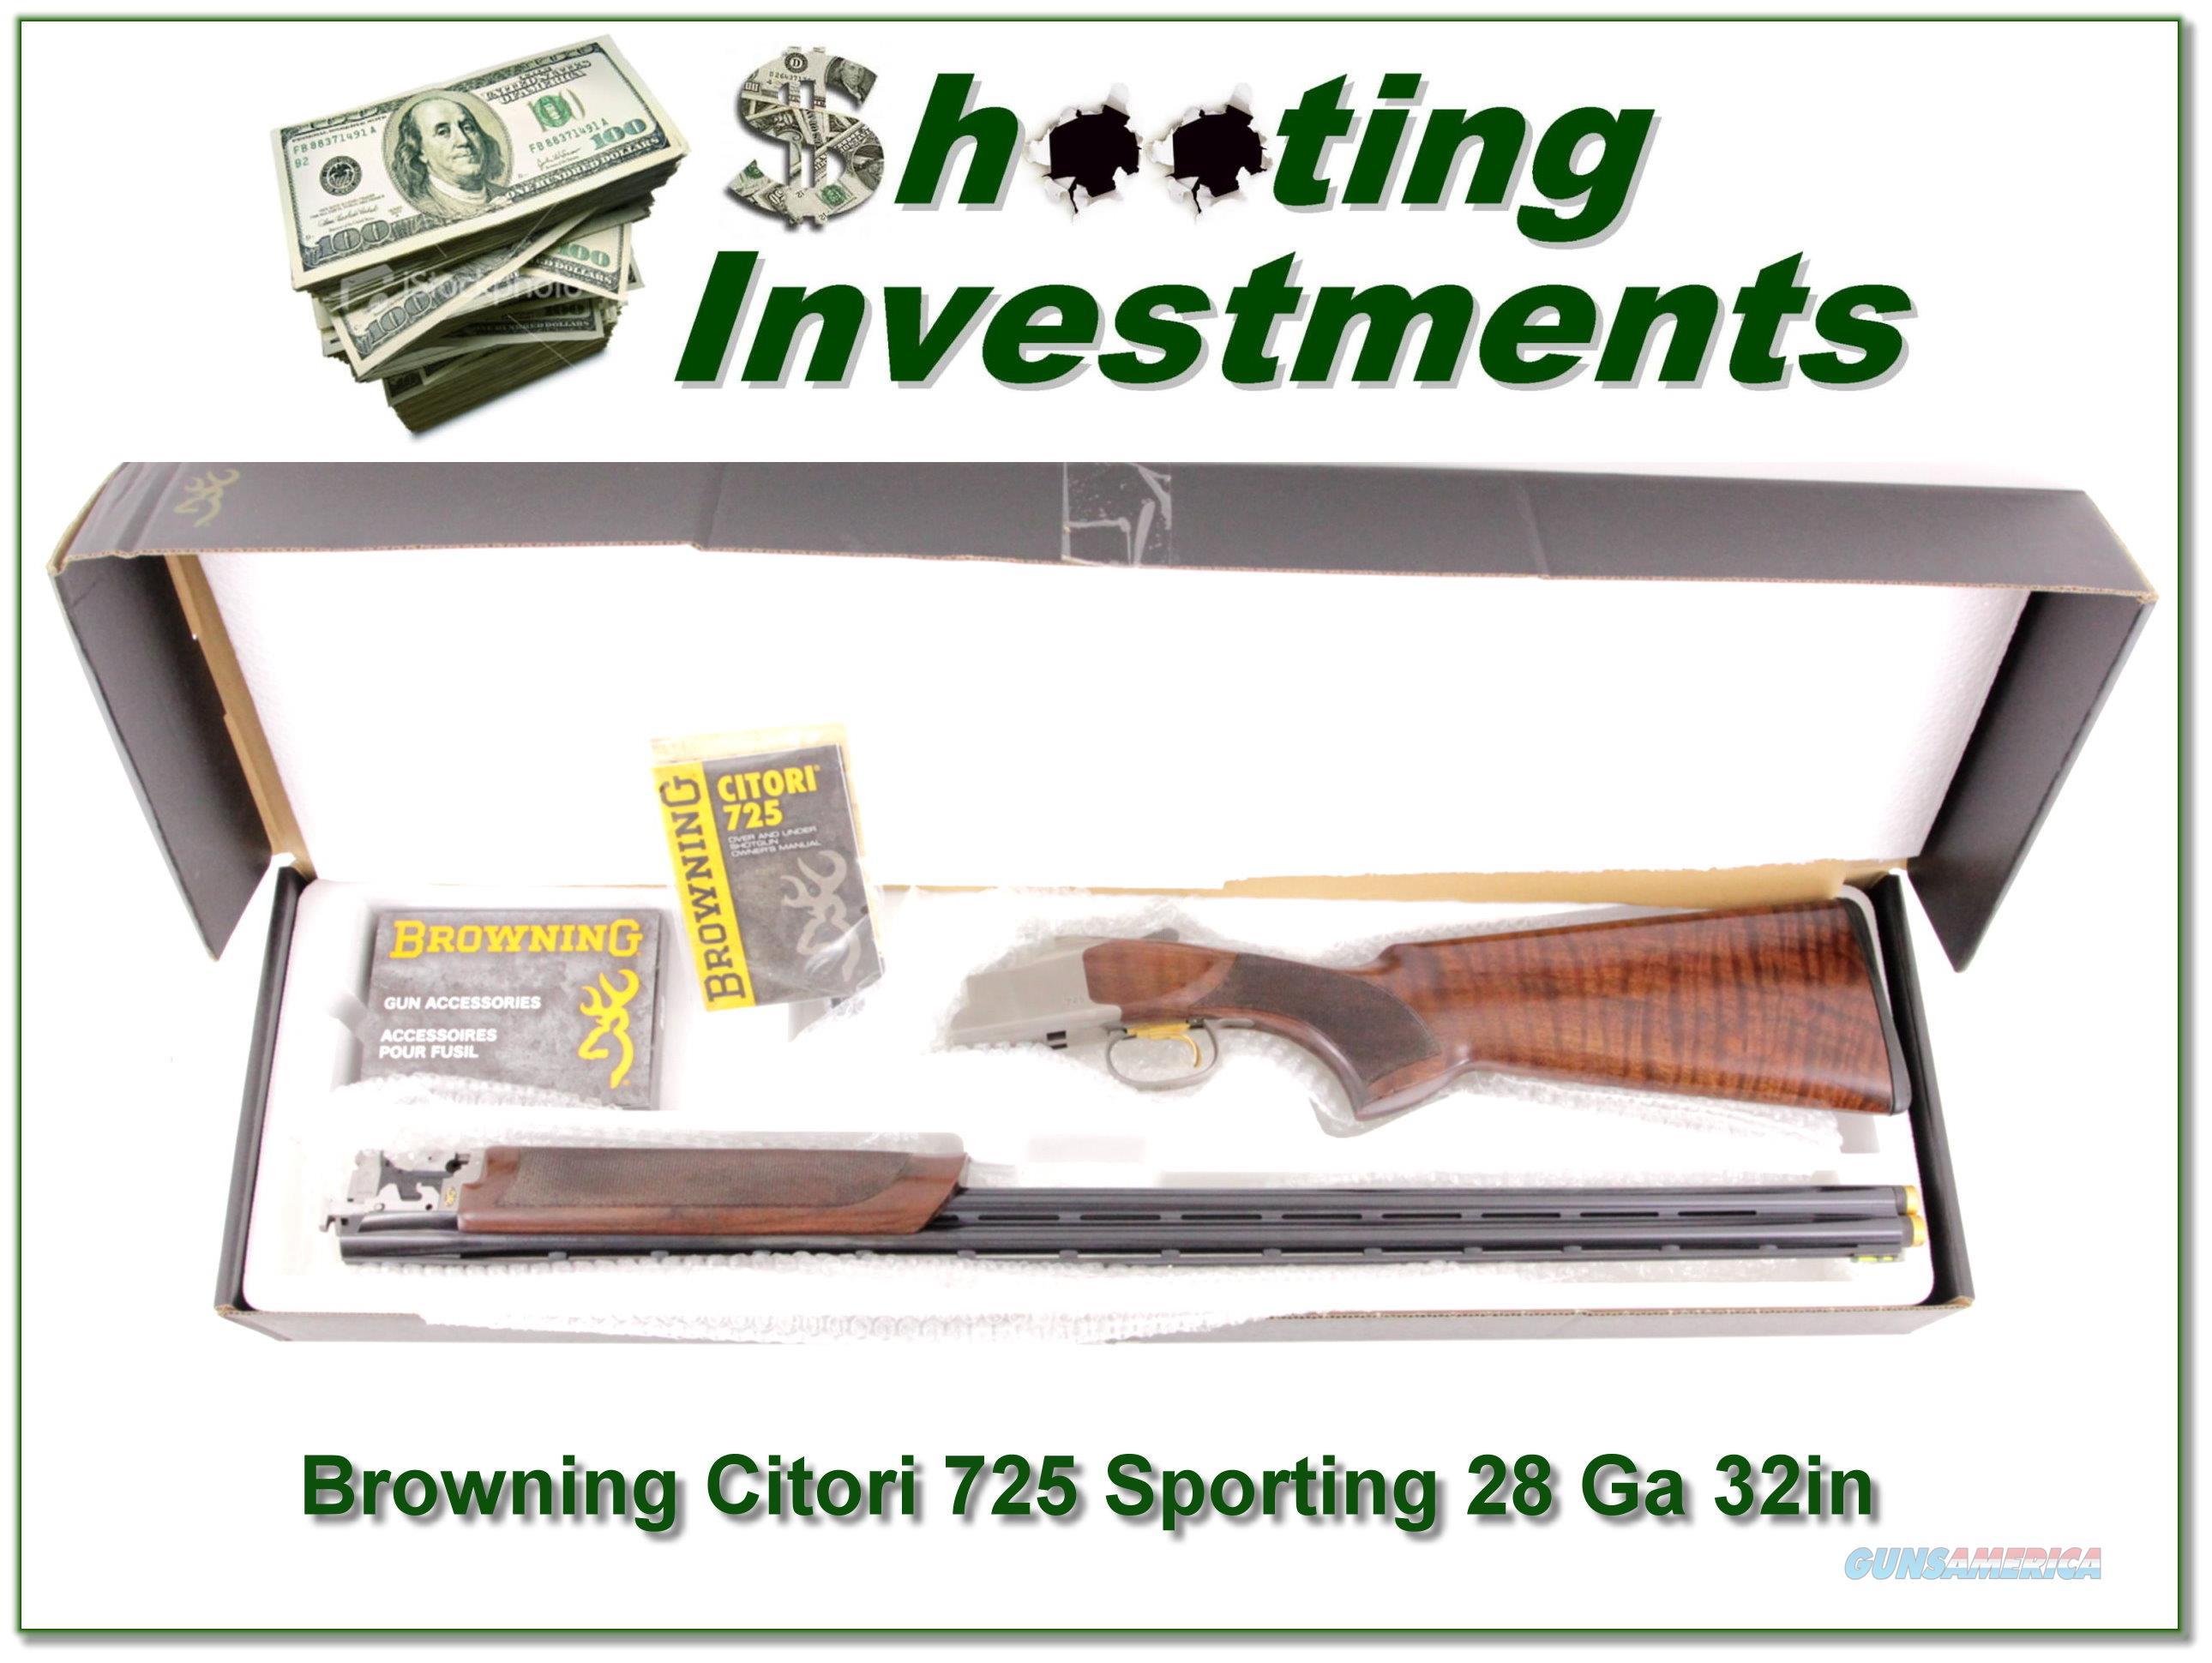 Browning Citori 725 Sporting 28 Gauge 32in in box!